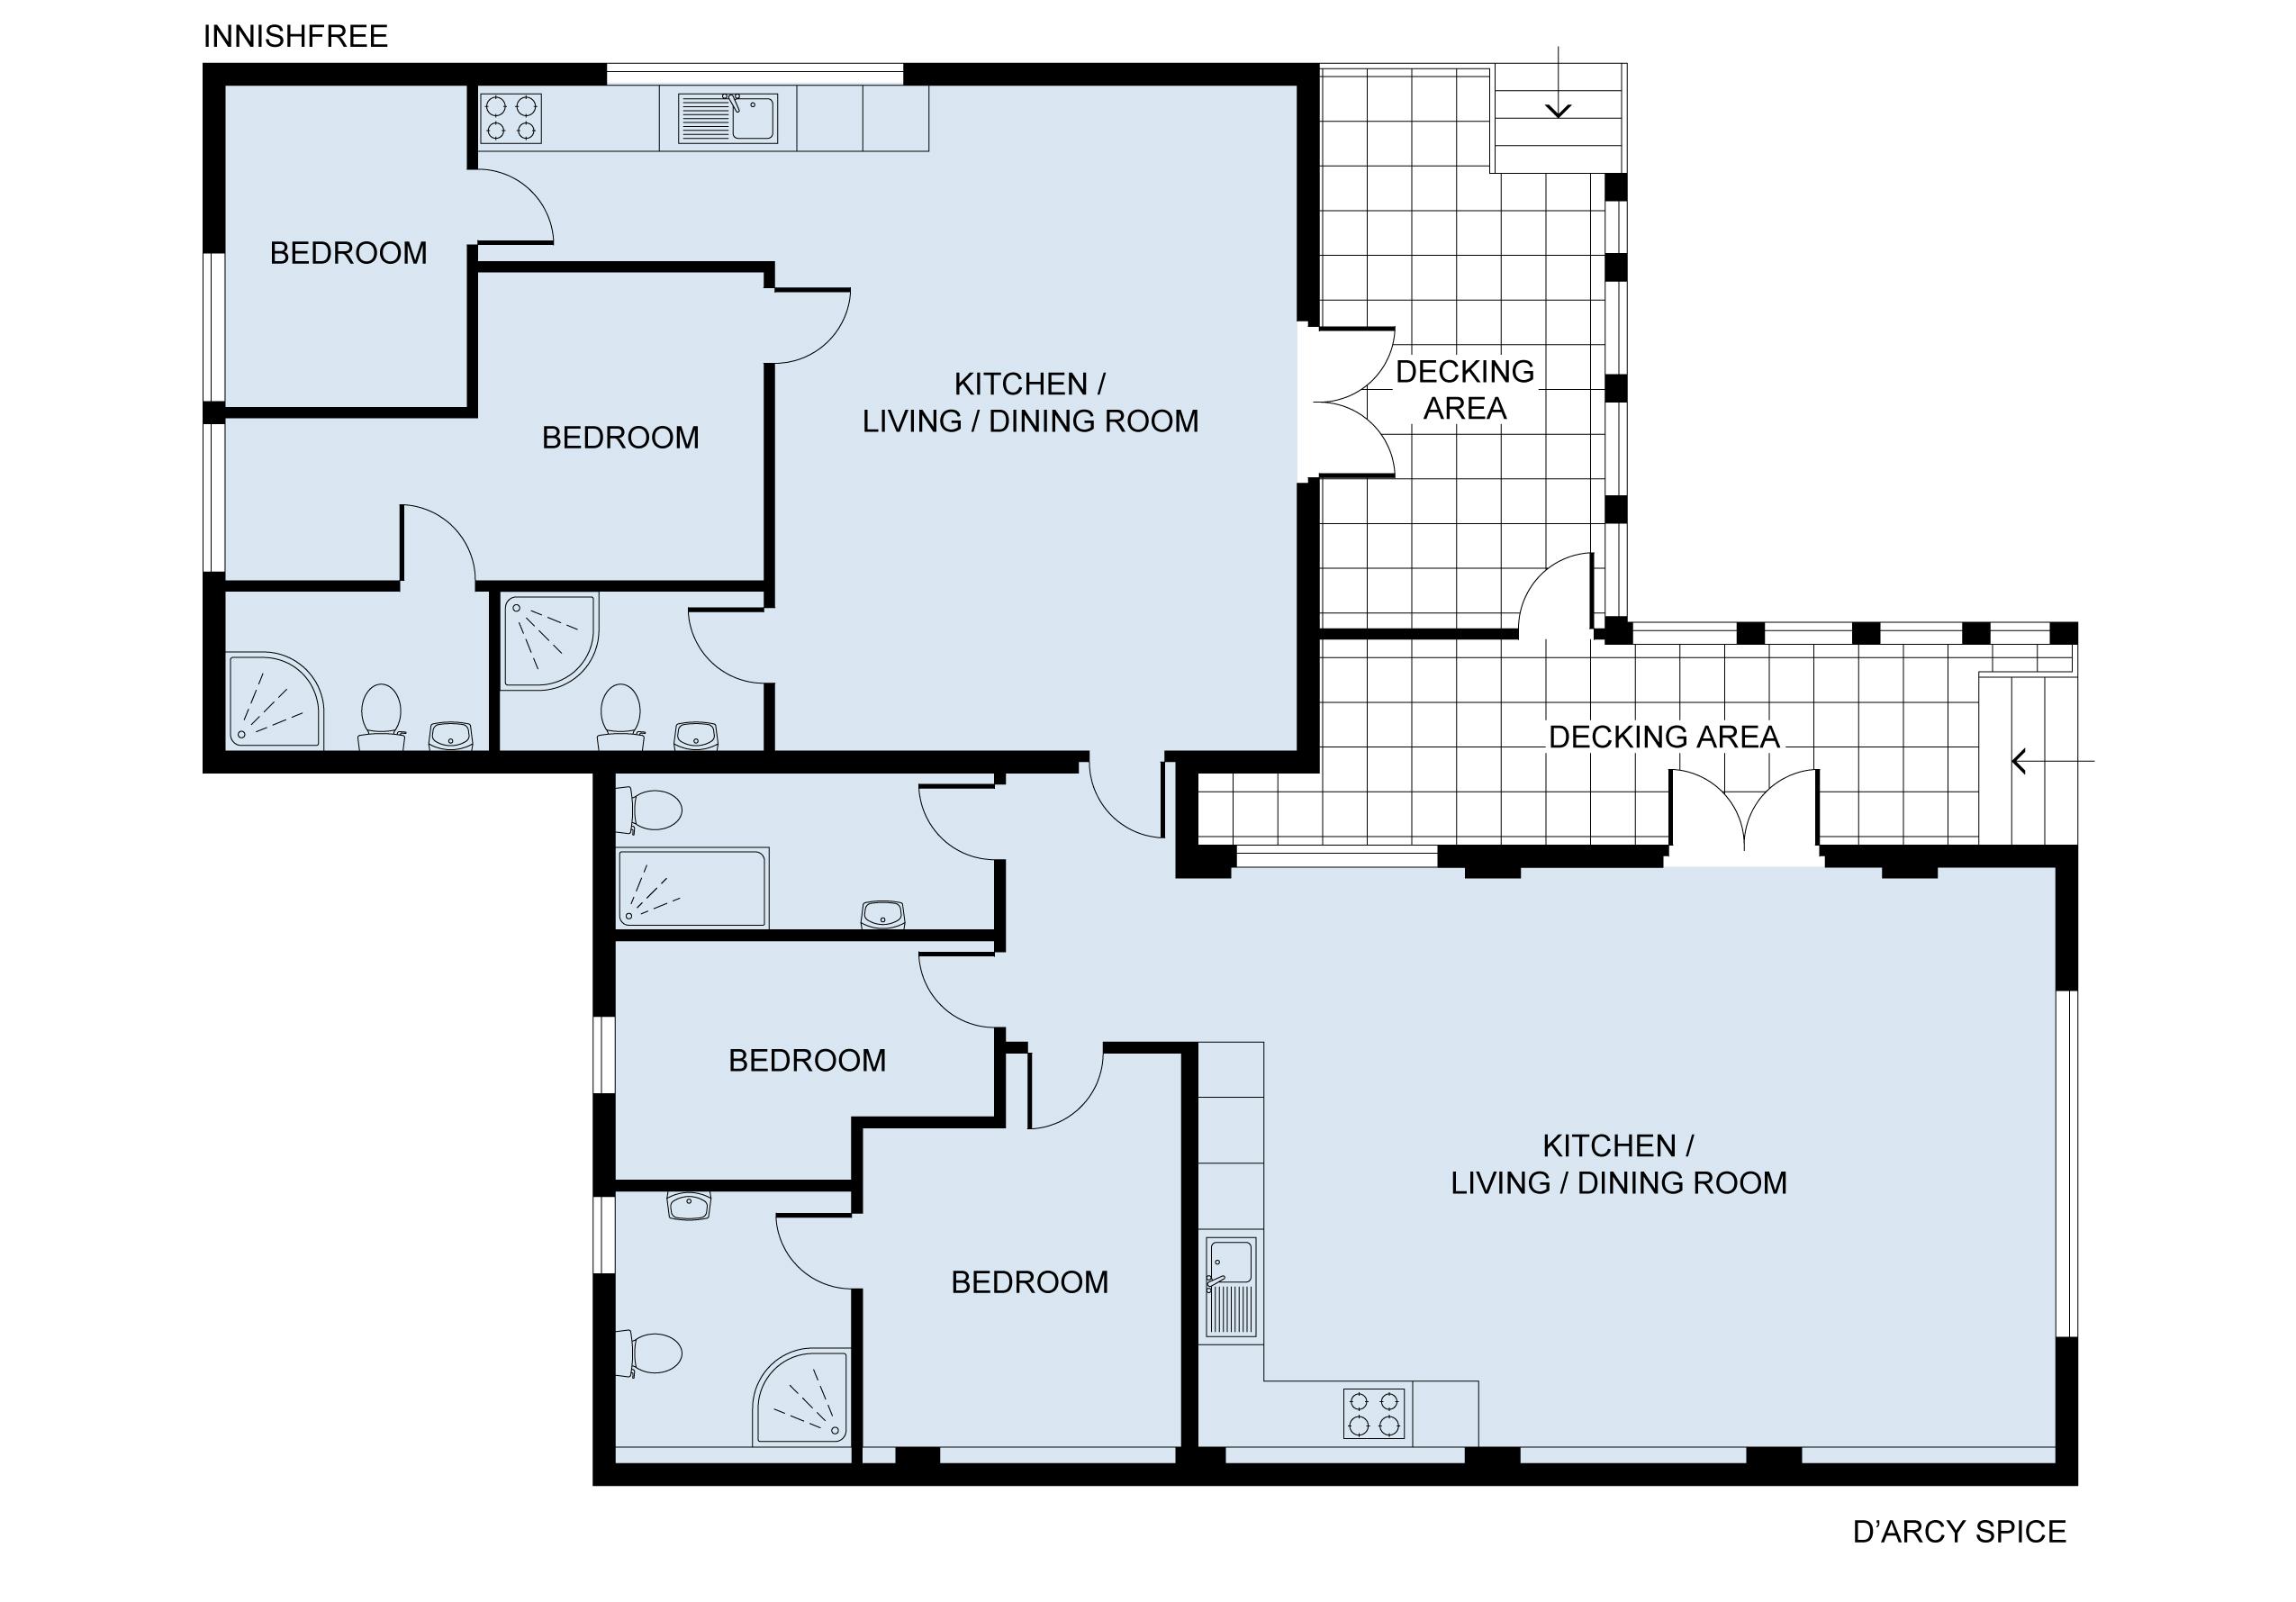 Floor plan Innishfree and adjoining D'Arcy Spice